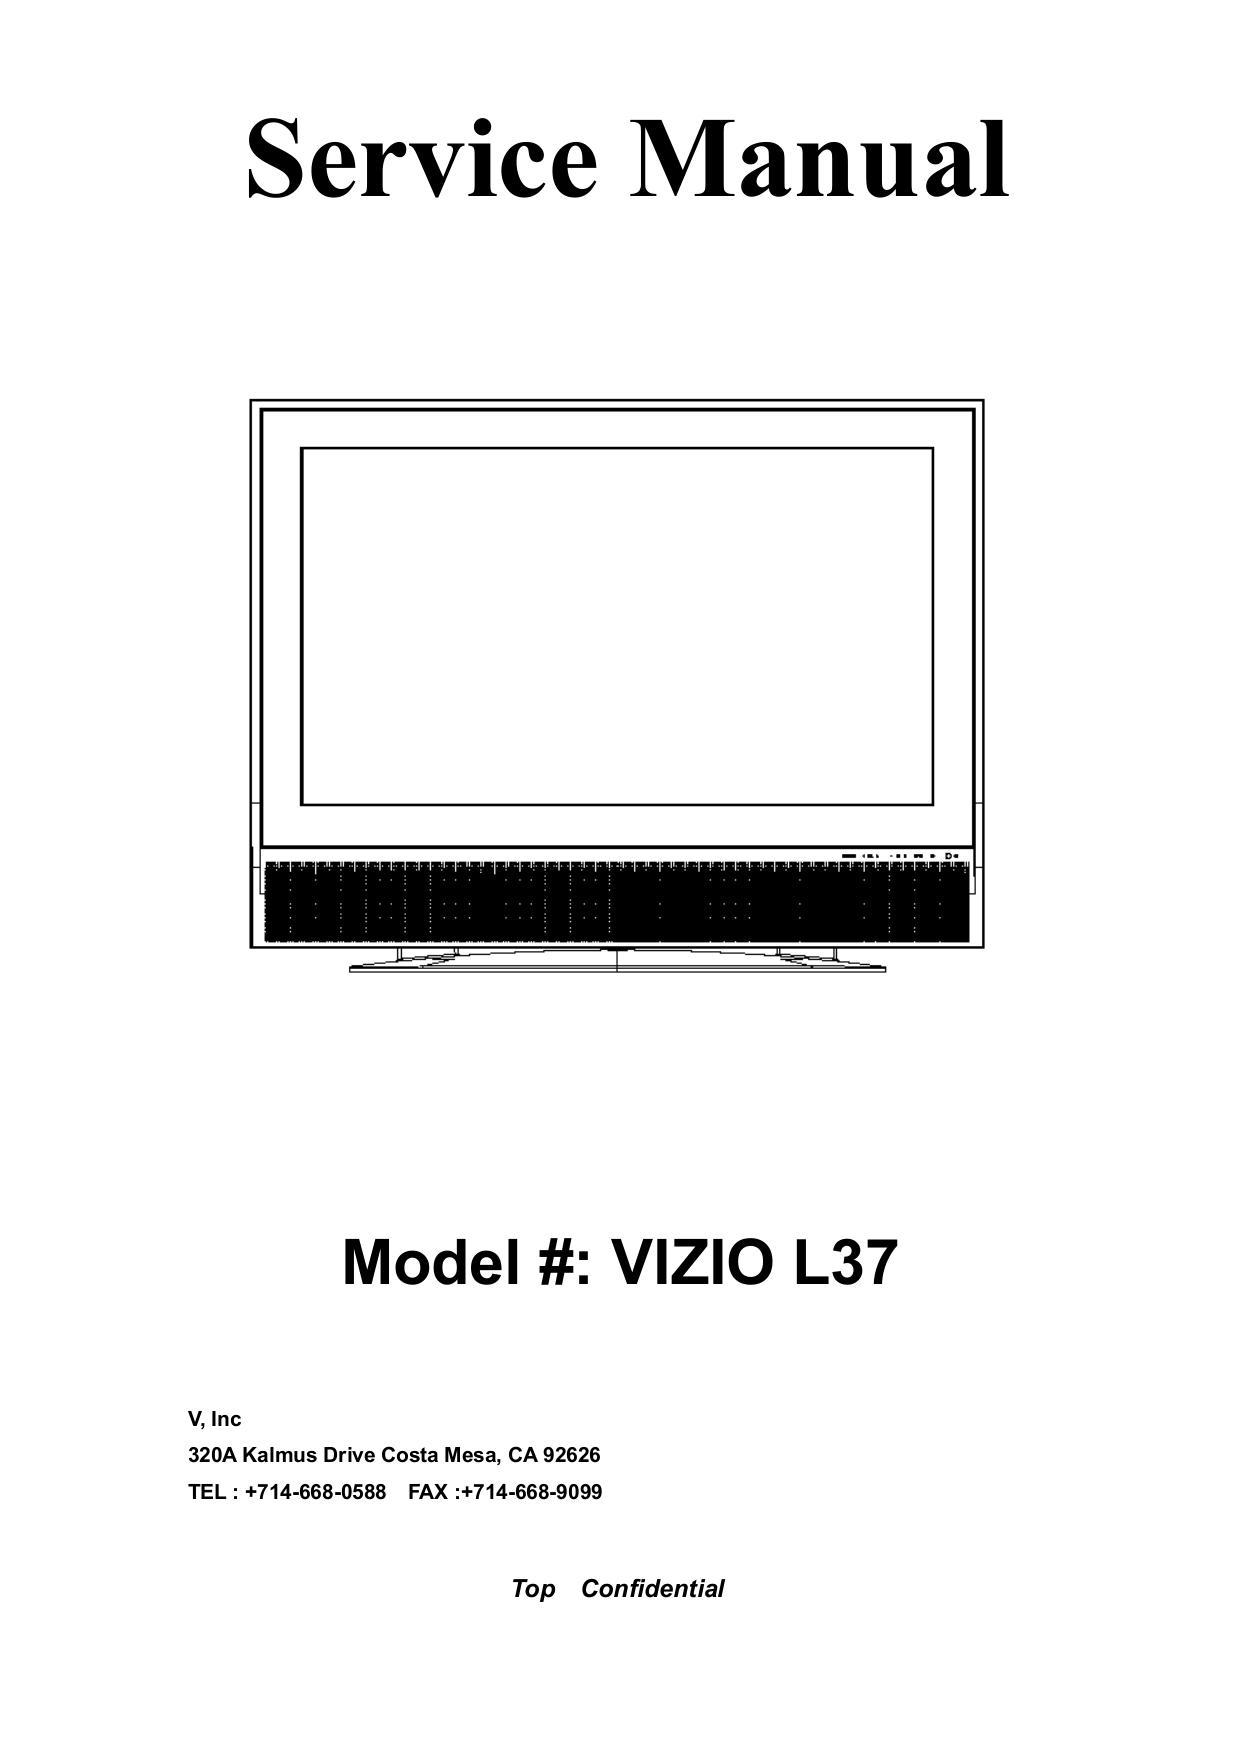 download free pdf for vizio vx240m tv manual rh umlib com Vizio Replacement Parts Vizio TV